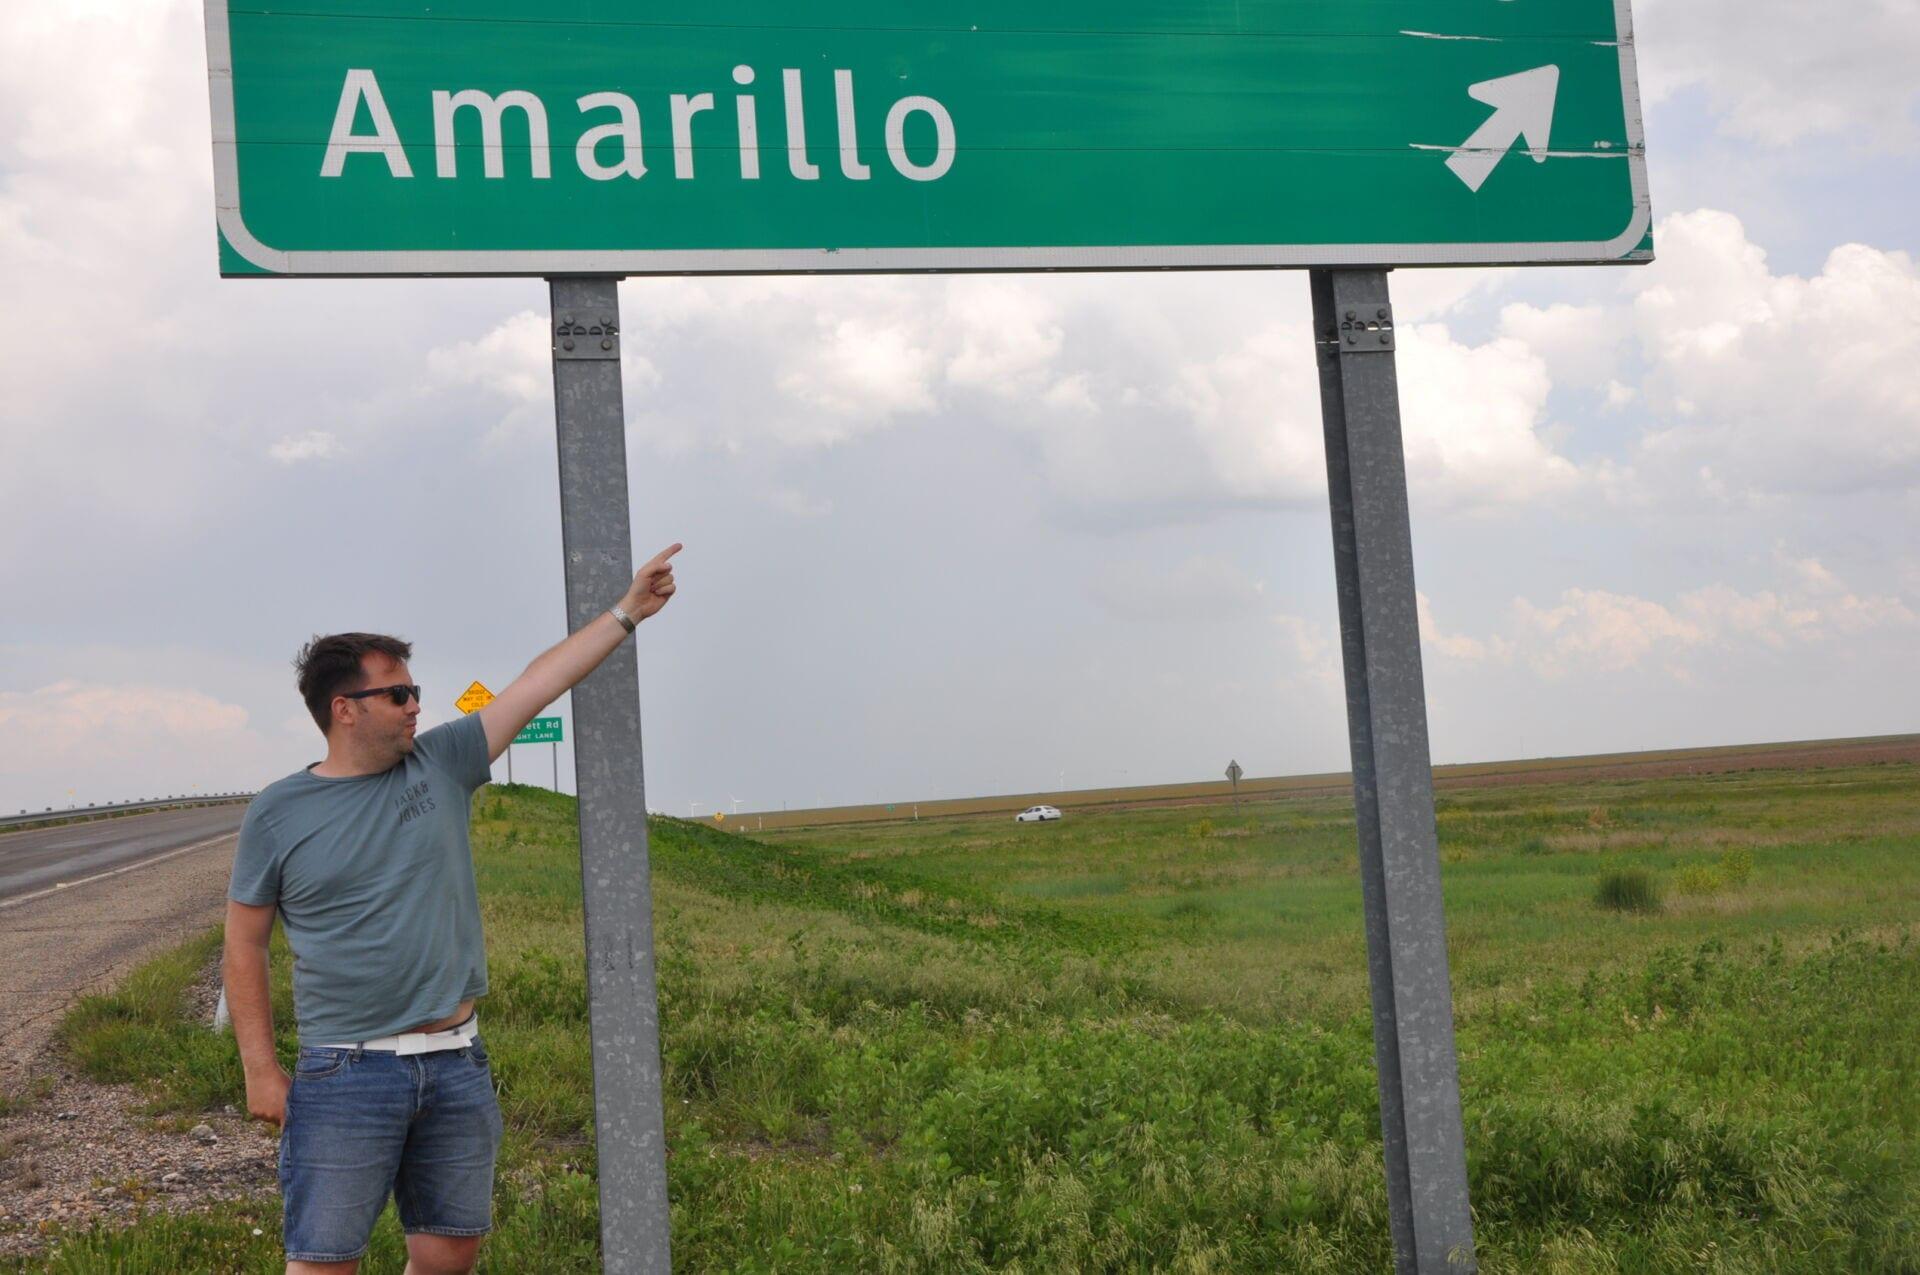 Amarillo Road Sign Route 66 Texas